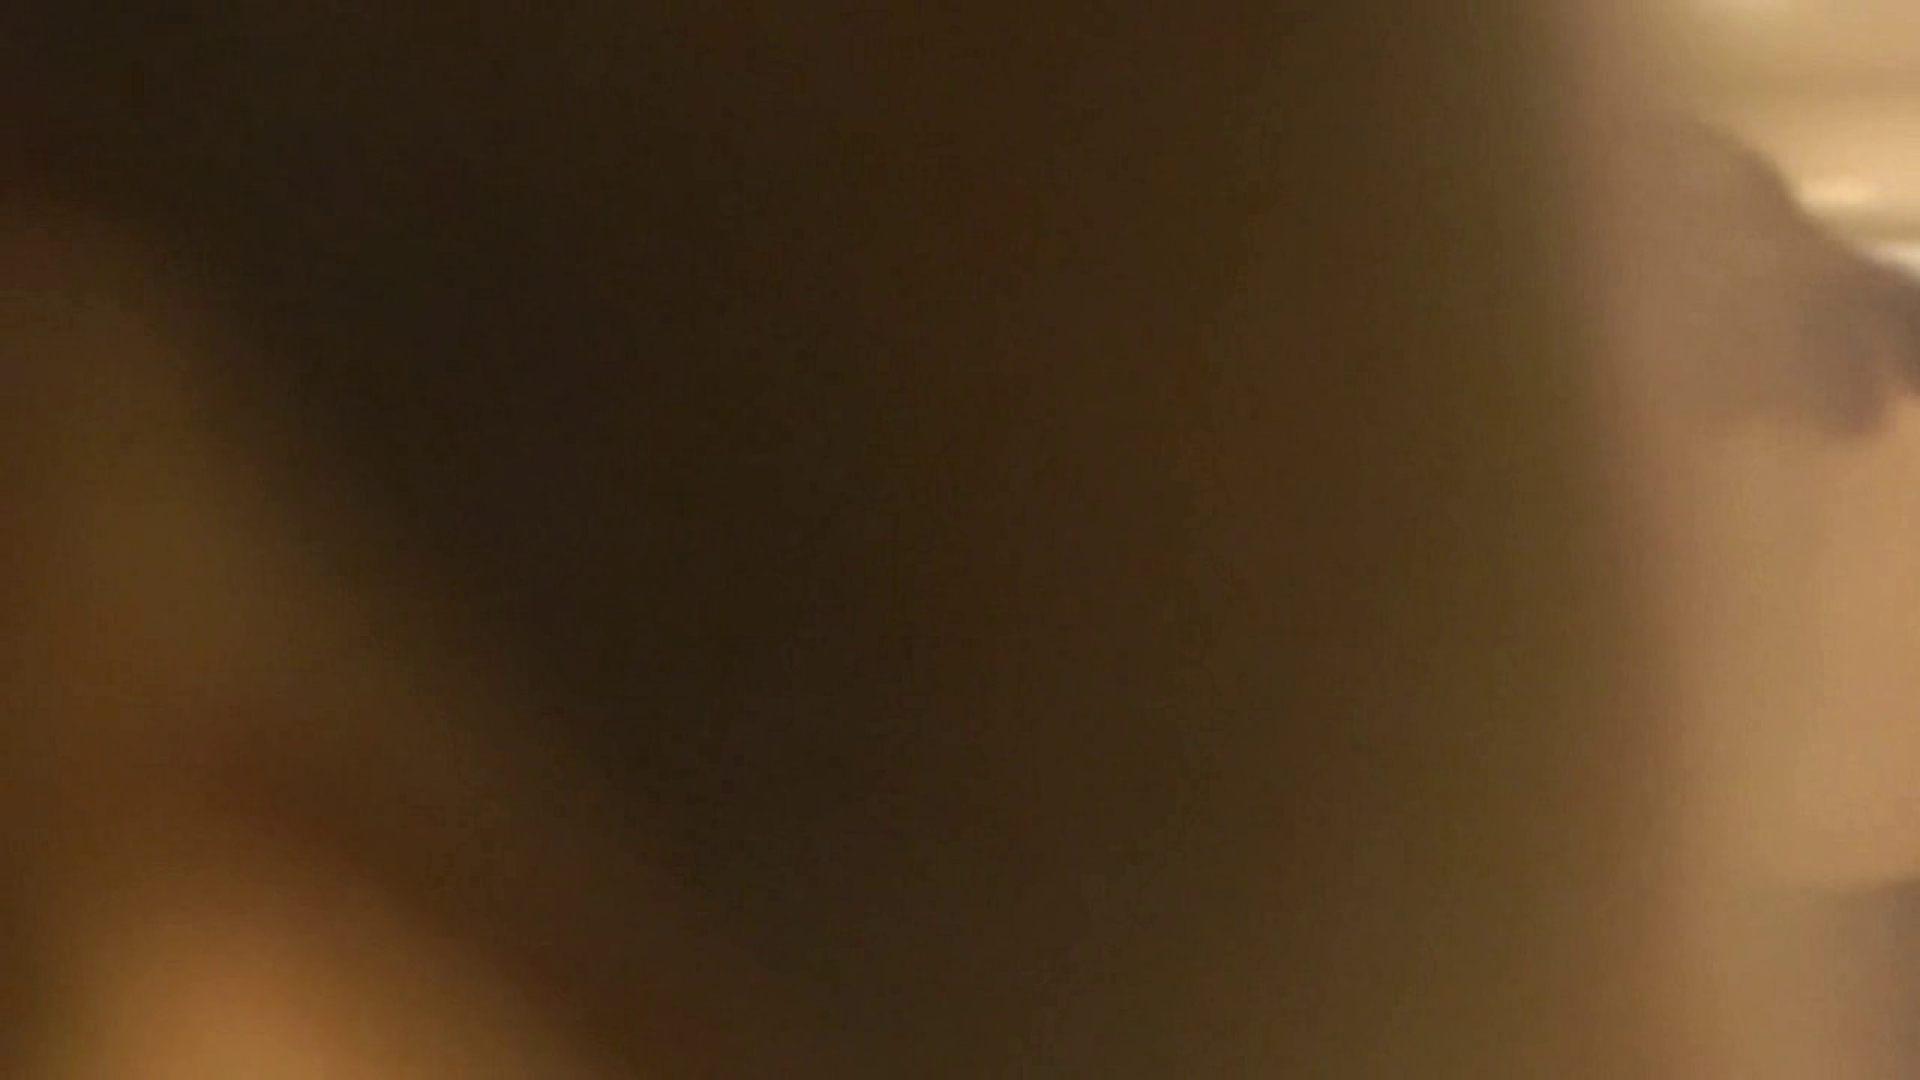 vol.1 Mayumi 窓越しに入浴シーン撮影に成功 入浴中の女性  57PIX 2